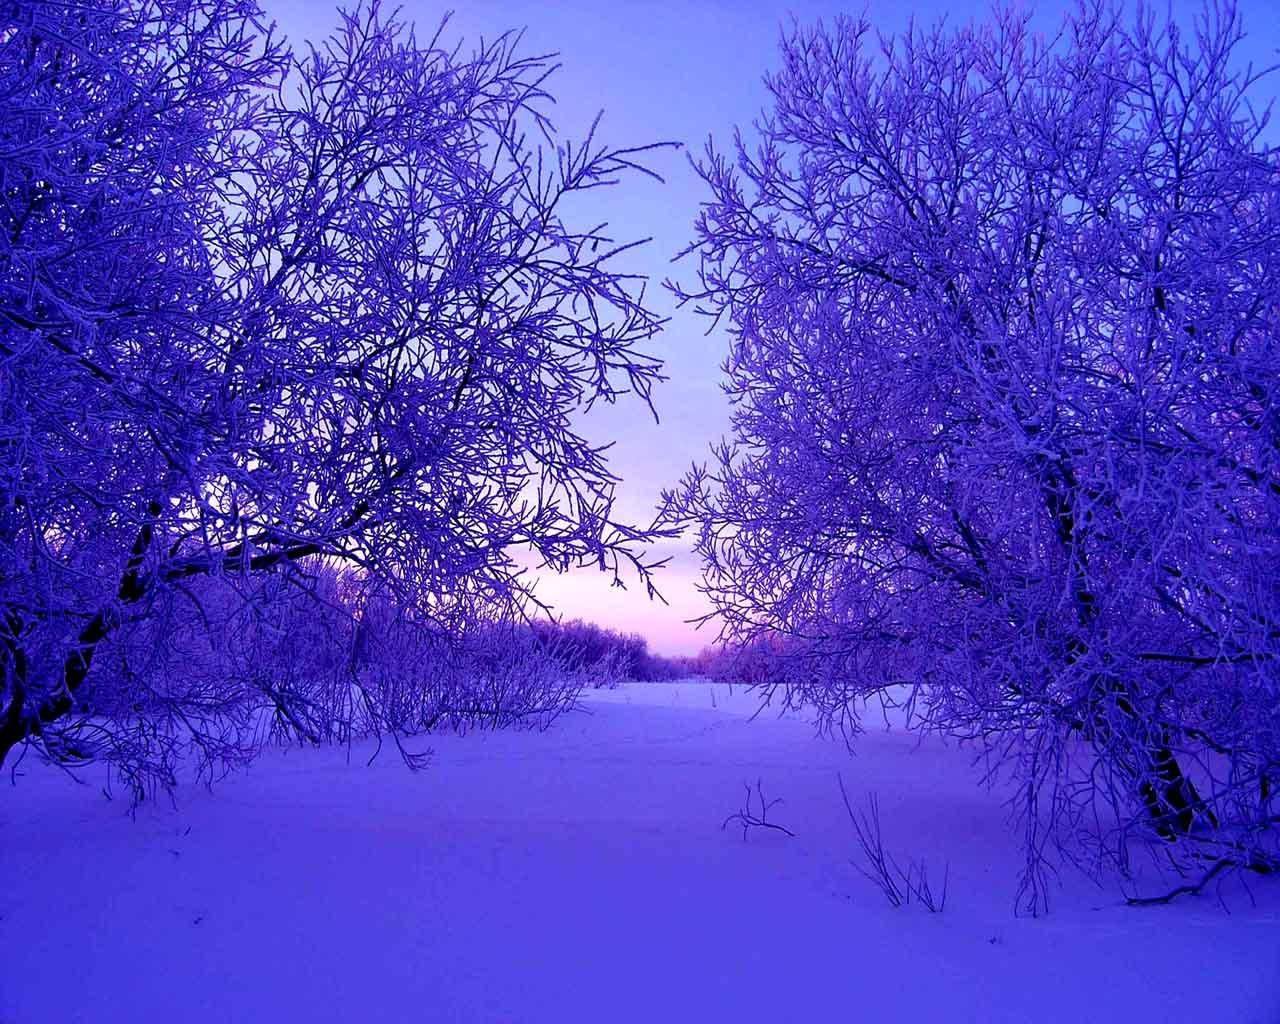 fond d 39 cran lumi re du soleil des arbres paysage la nature ciel hiver violet branche. Black Bedroom Furniture Sets. Home Design Ideas